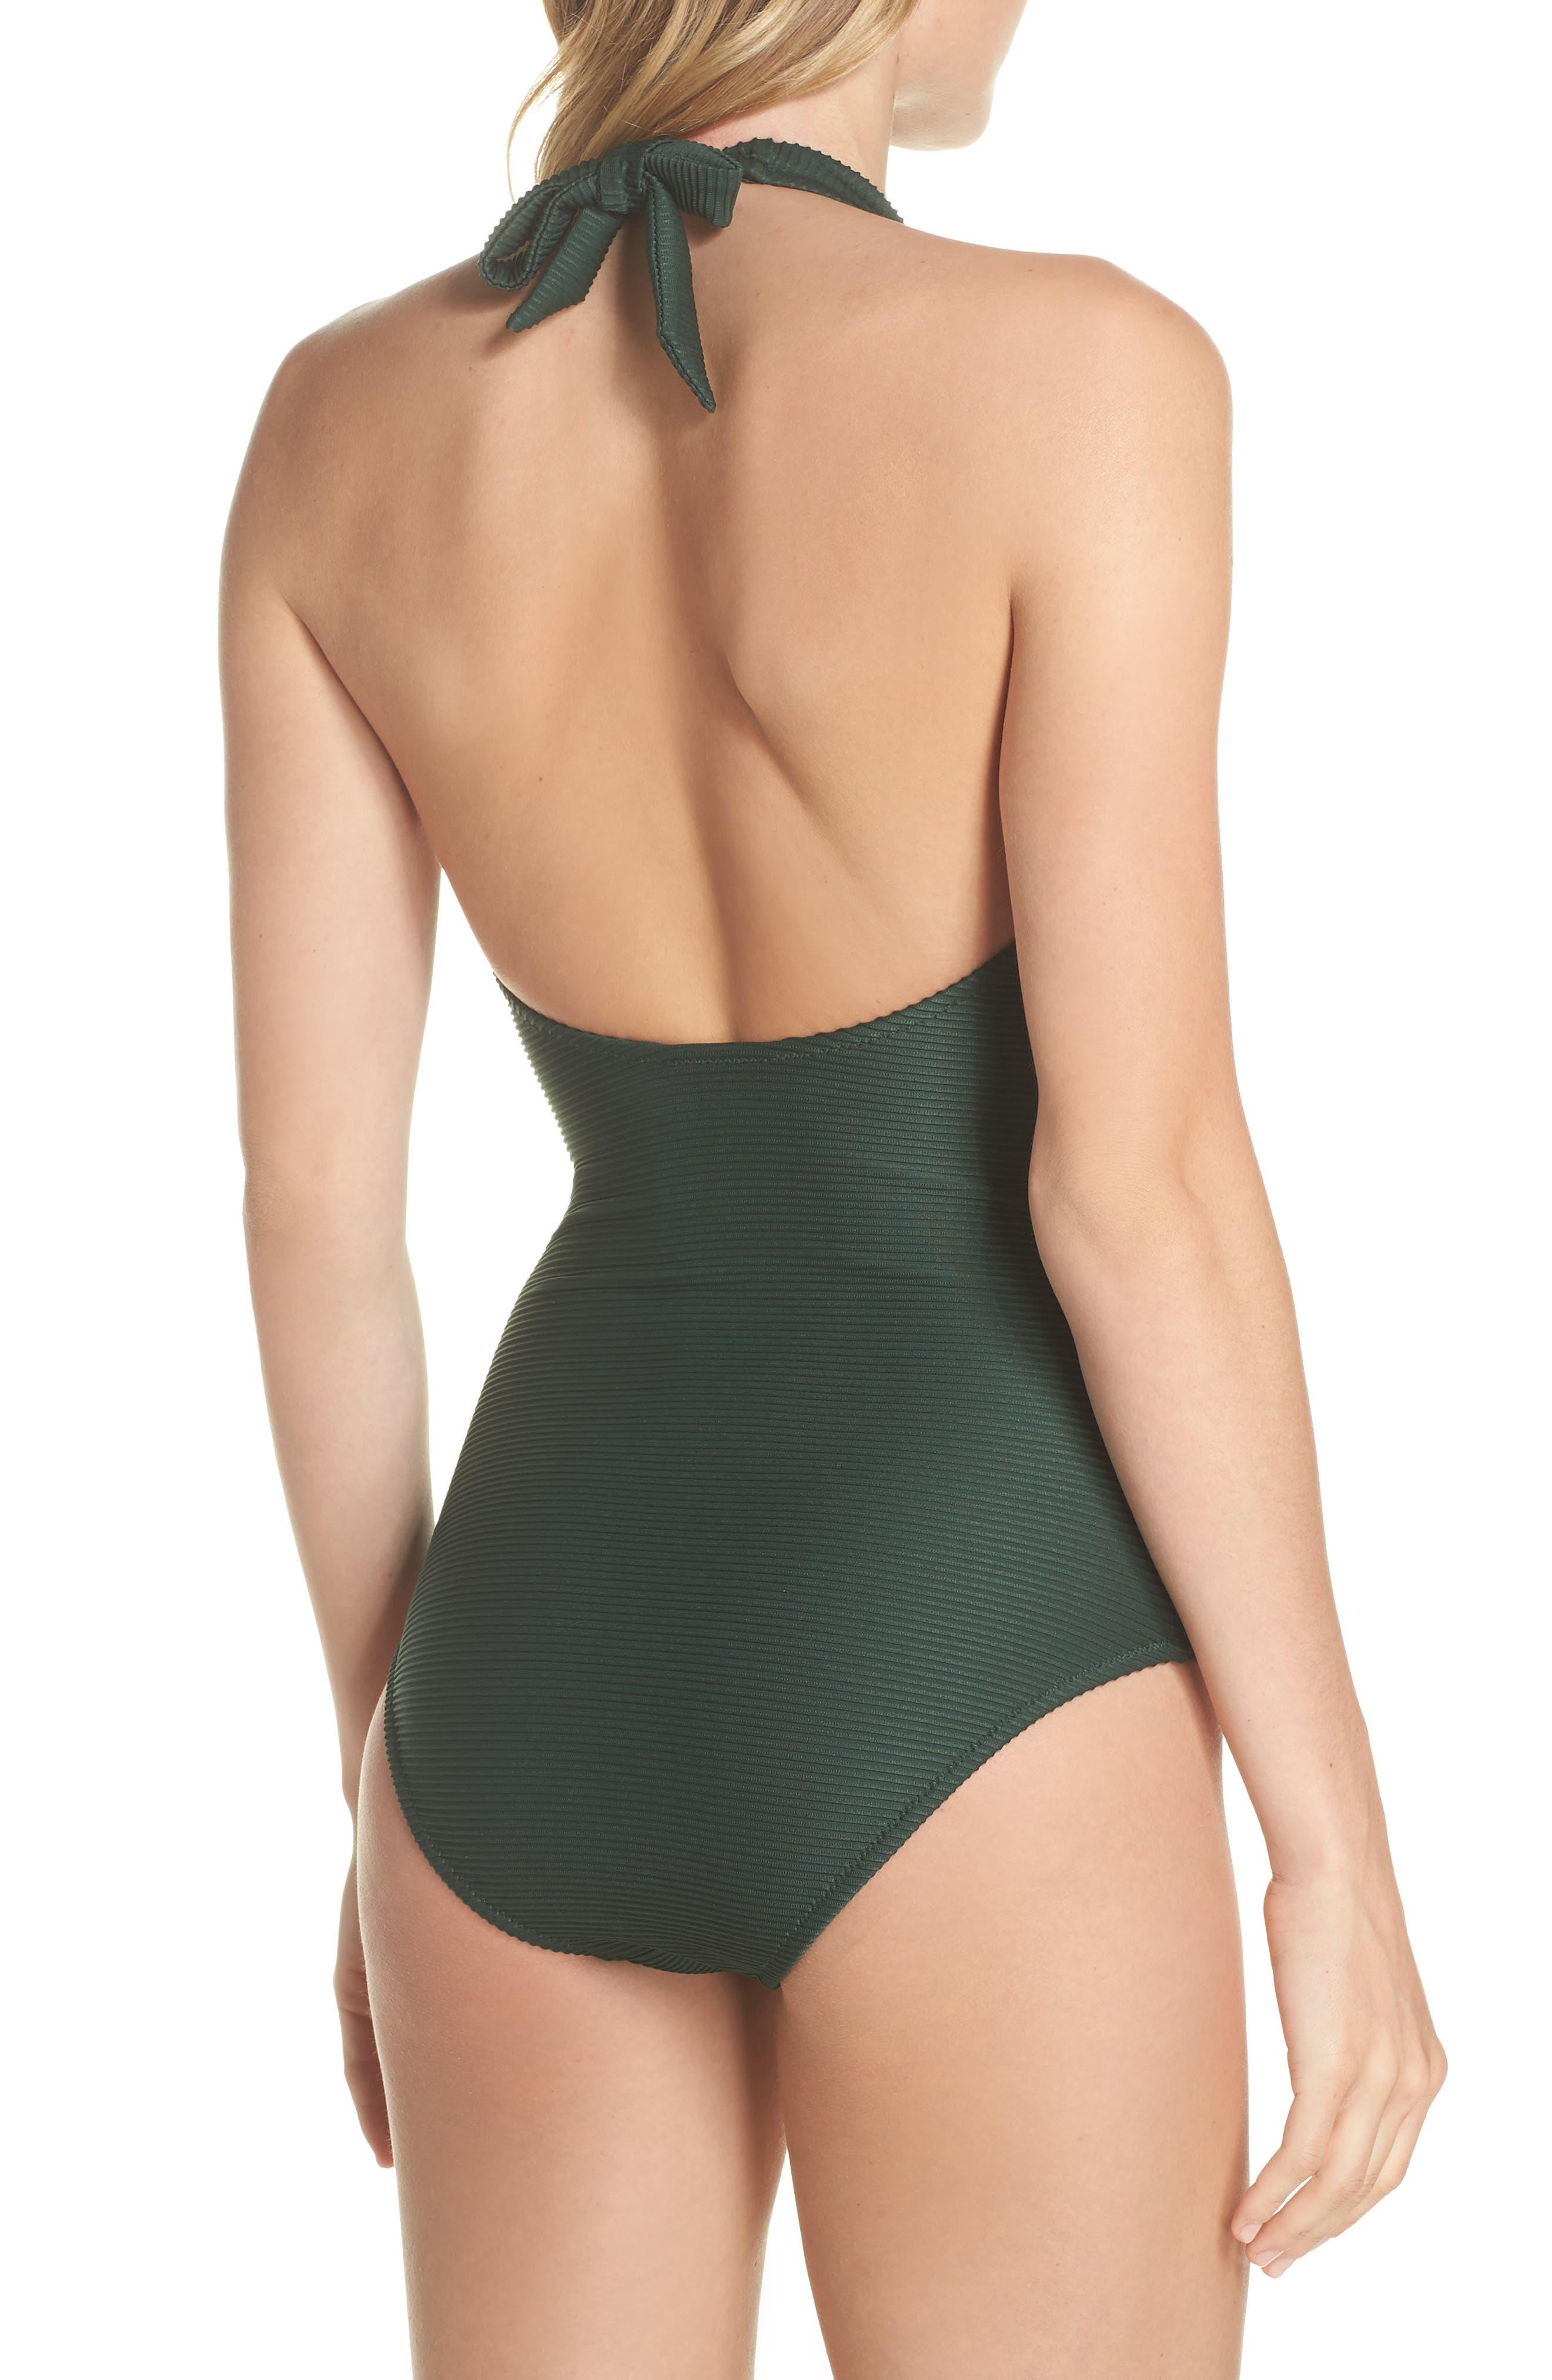 V-Bar One-Piece Halter Swimsuit,                             Alternate thumbnail 2, color,                             GREEN